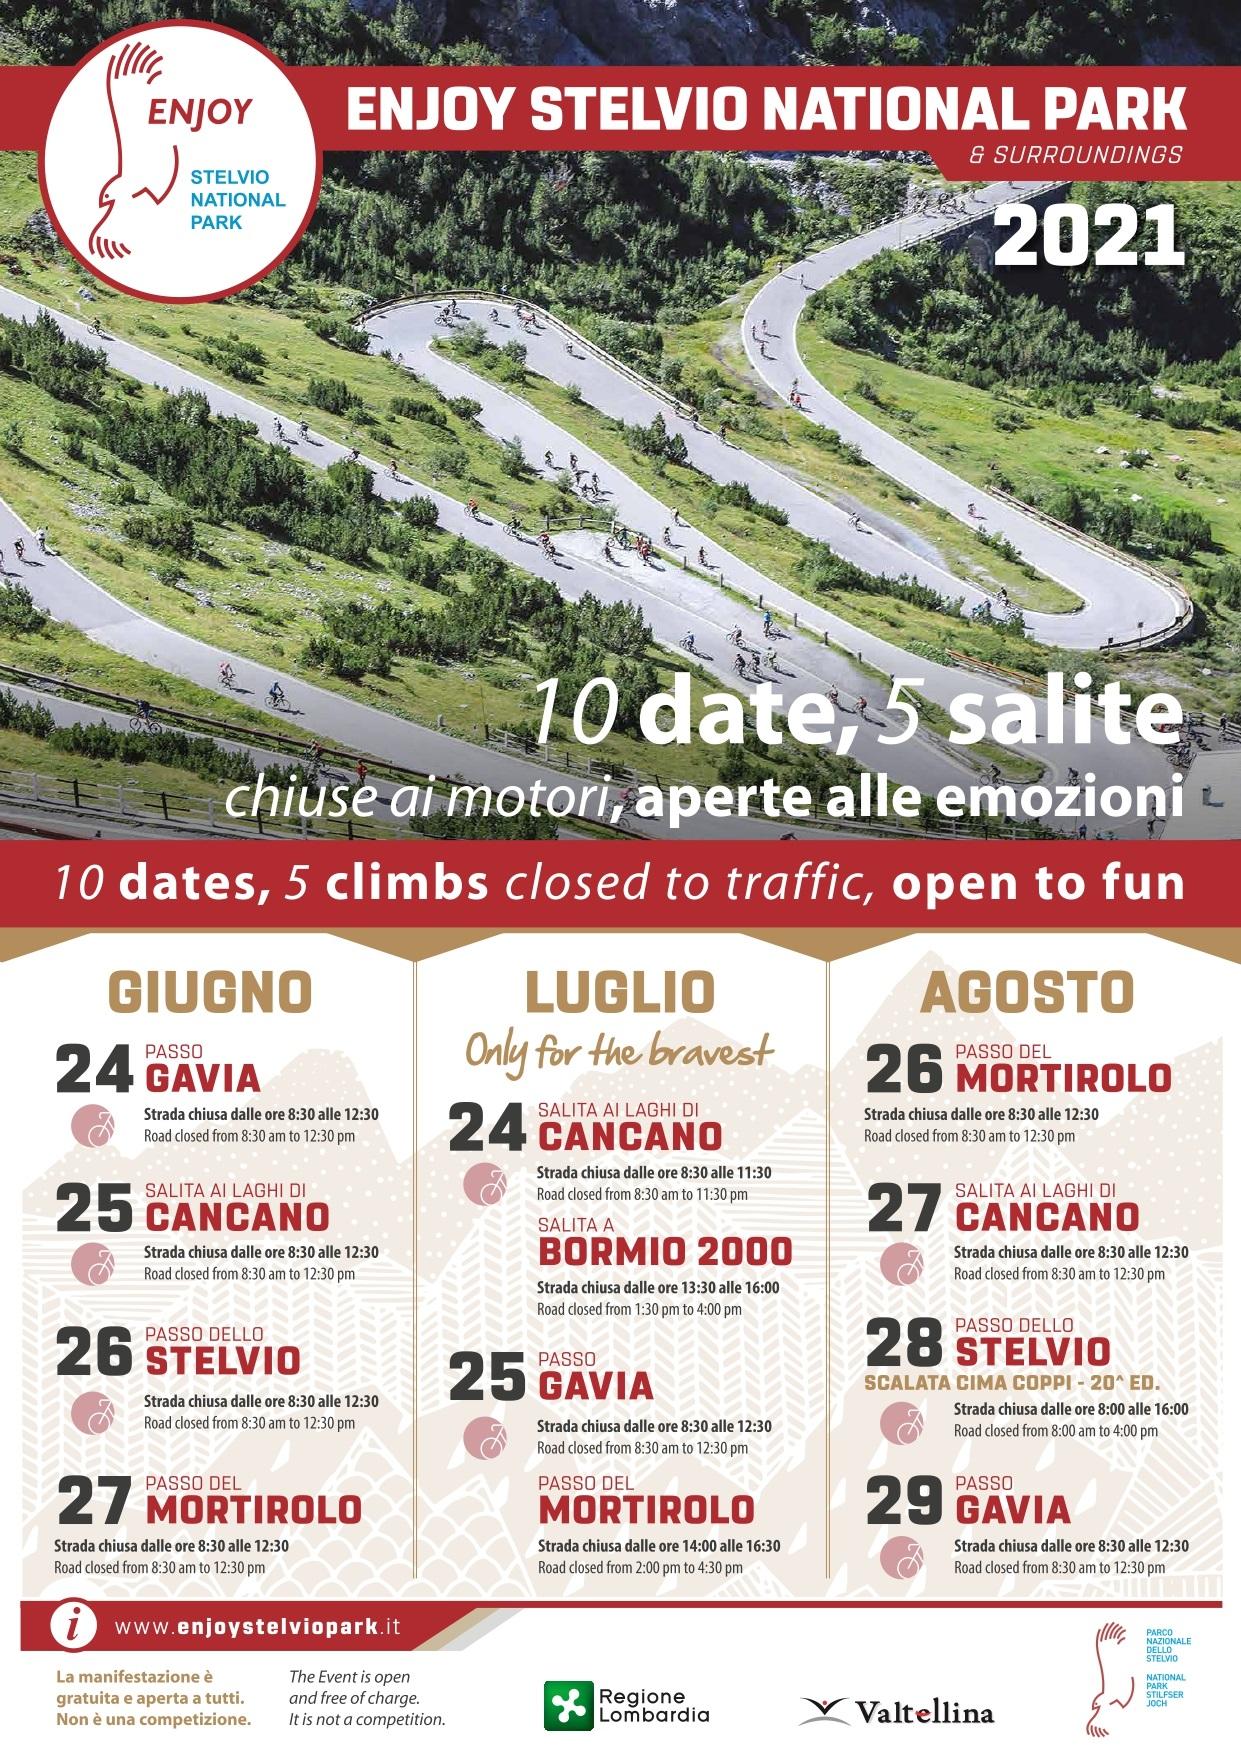 Enjoy Stelvio National Park